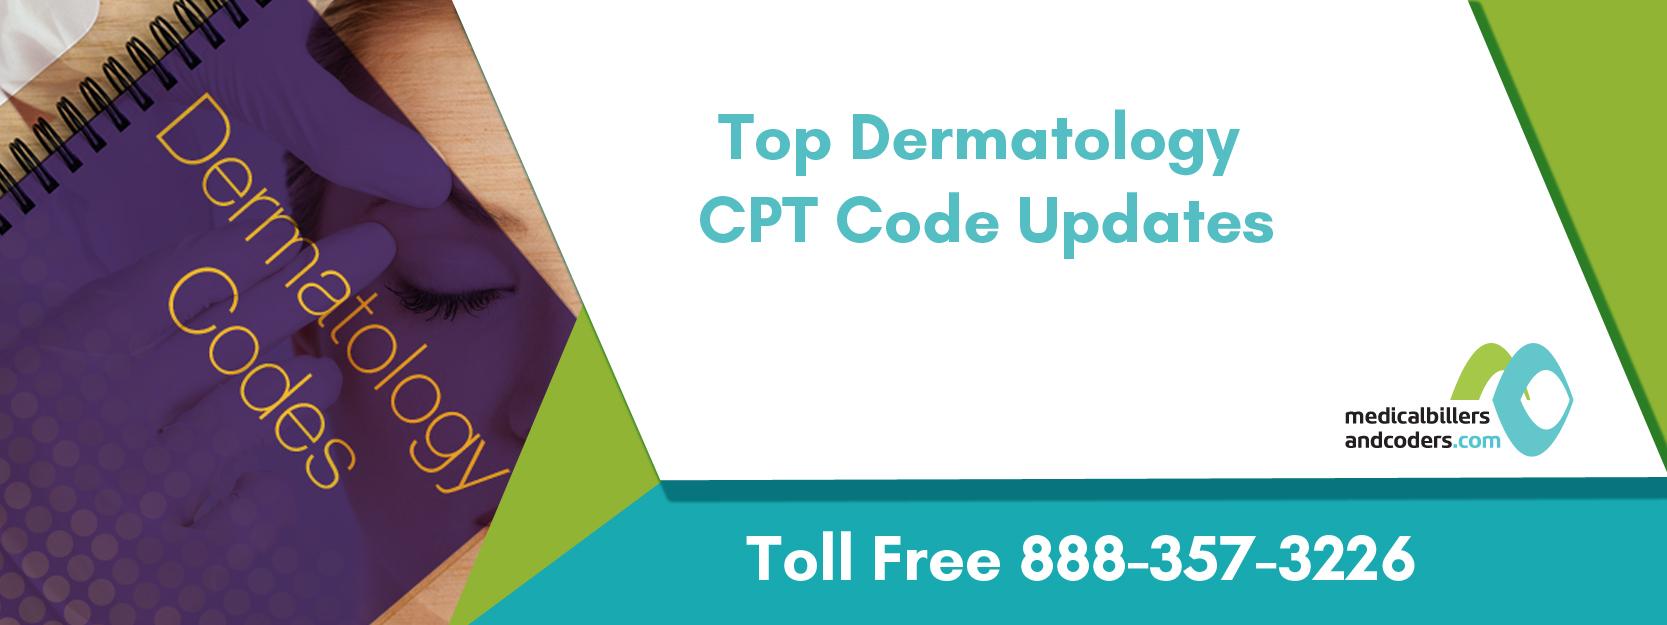 blog-top-dermatology-cpt-code-updates